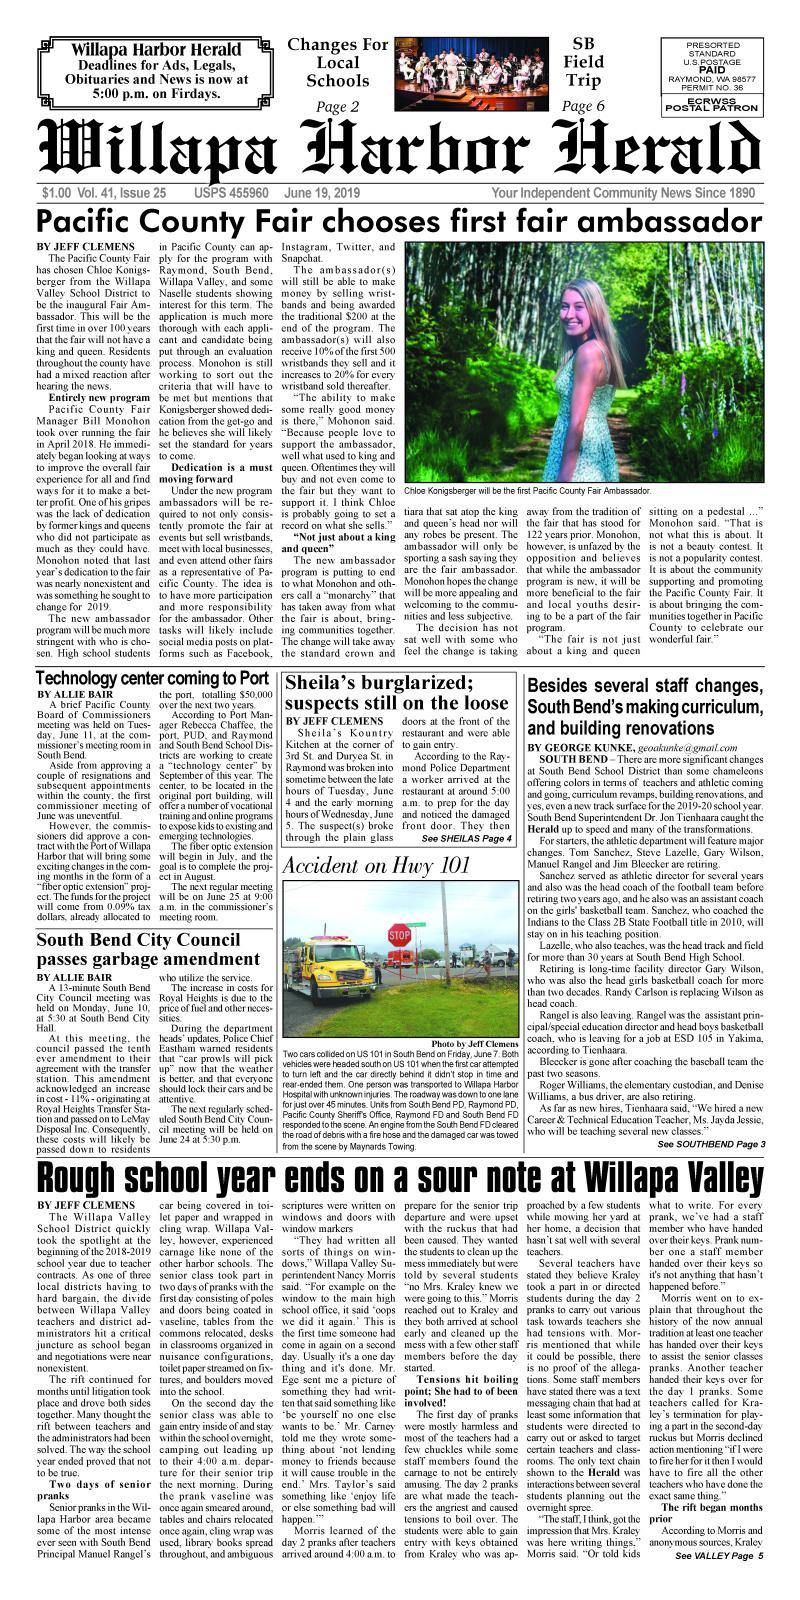 June 19, 2019 Willapa Harbor Herald